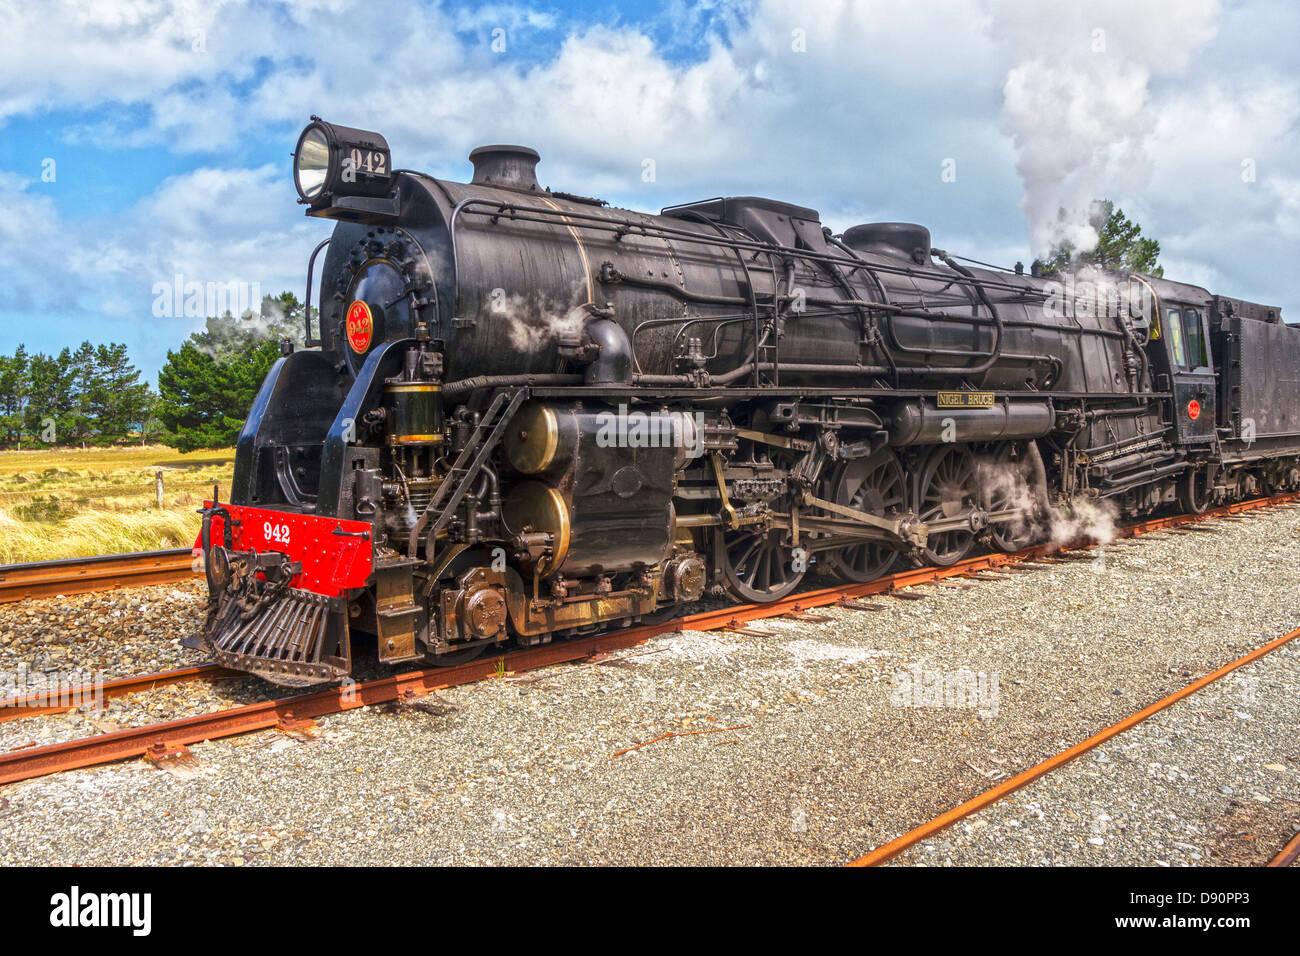 Free Images : track, train, asphalt, locomotive, publicdomain ...